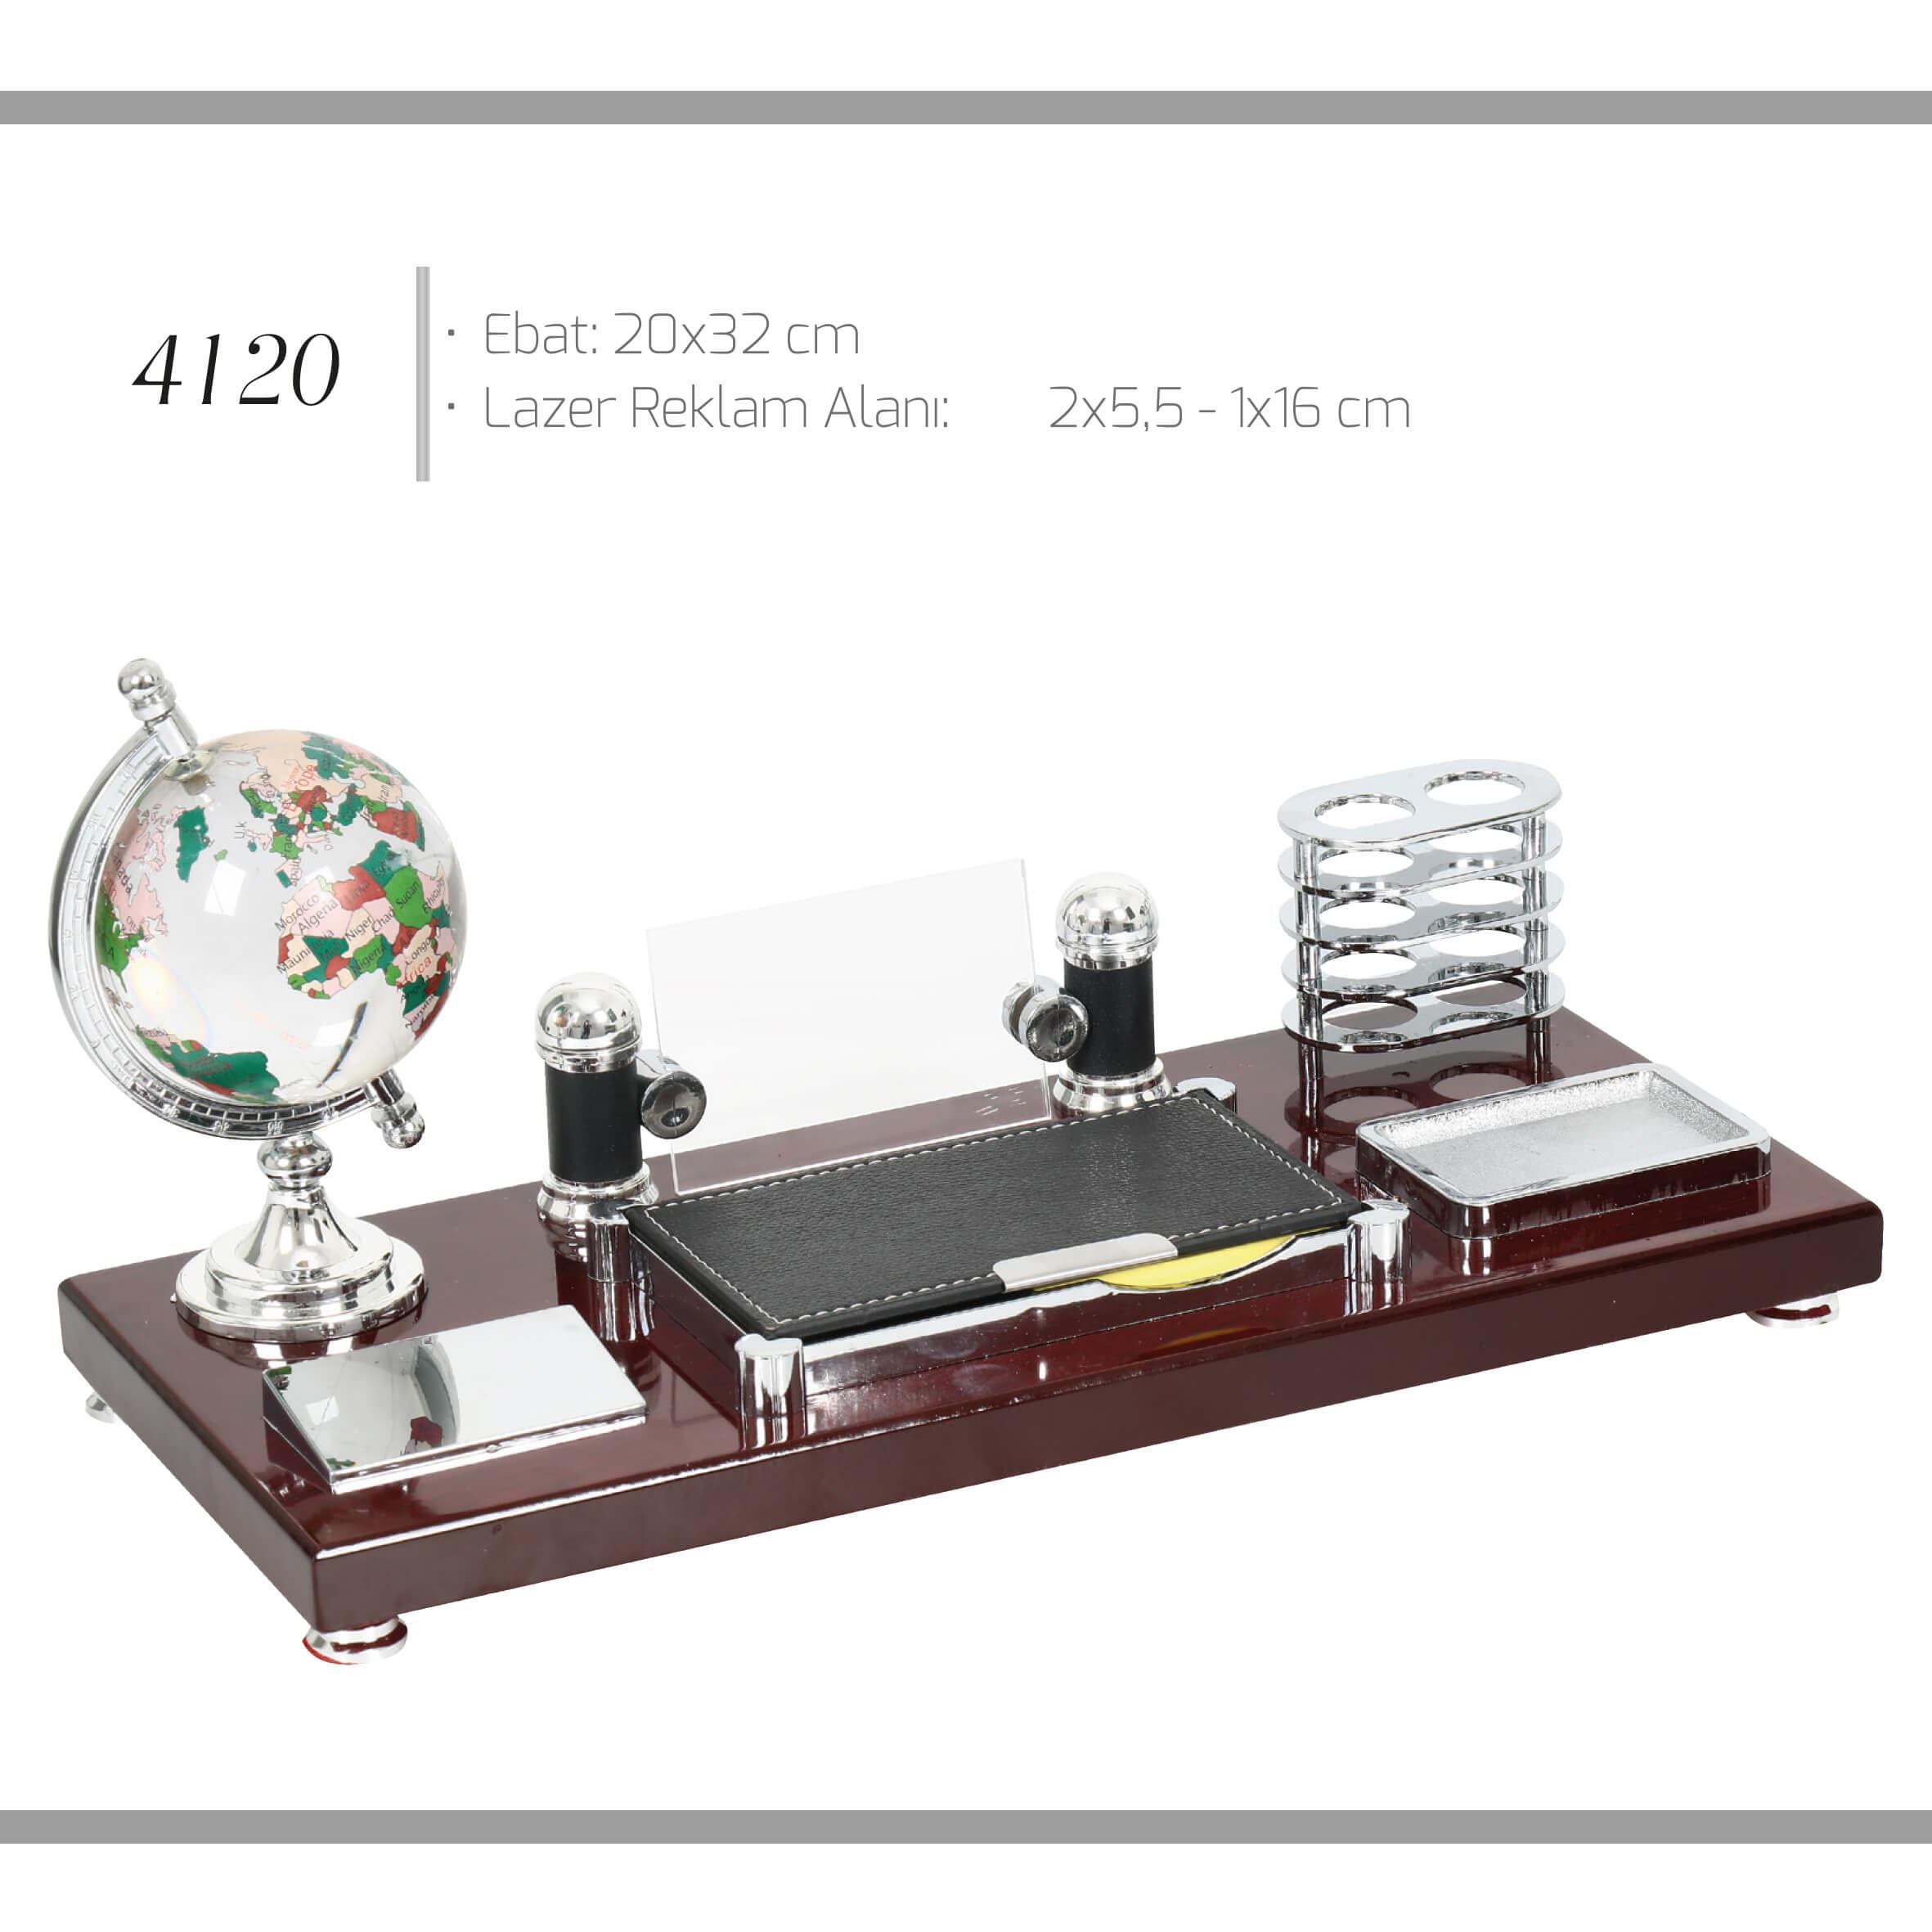 promosyon-promosyon ürünleri-promosyon masa seti-VIP Masa Seti 4120